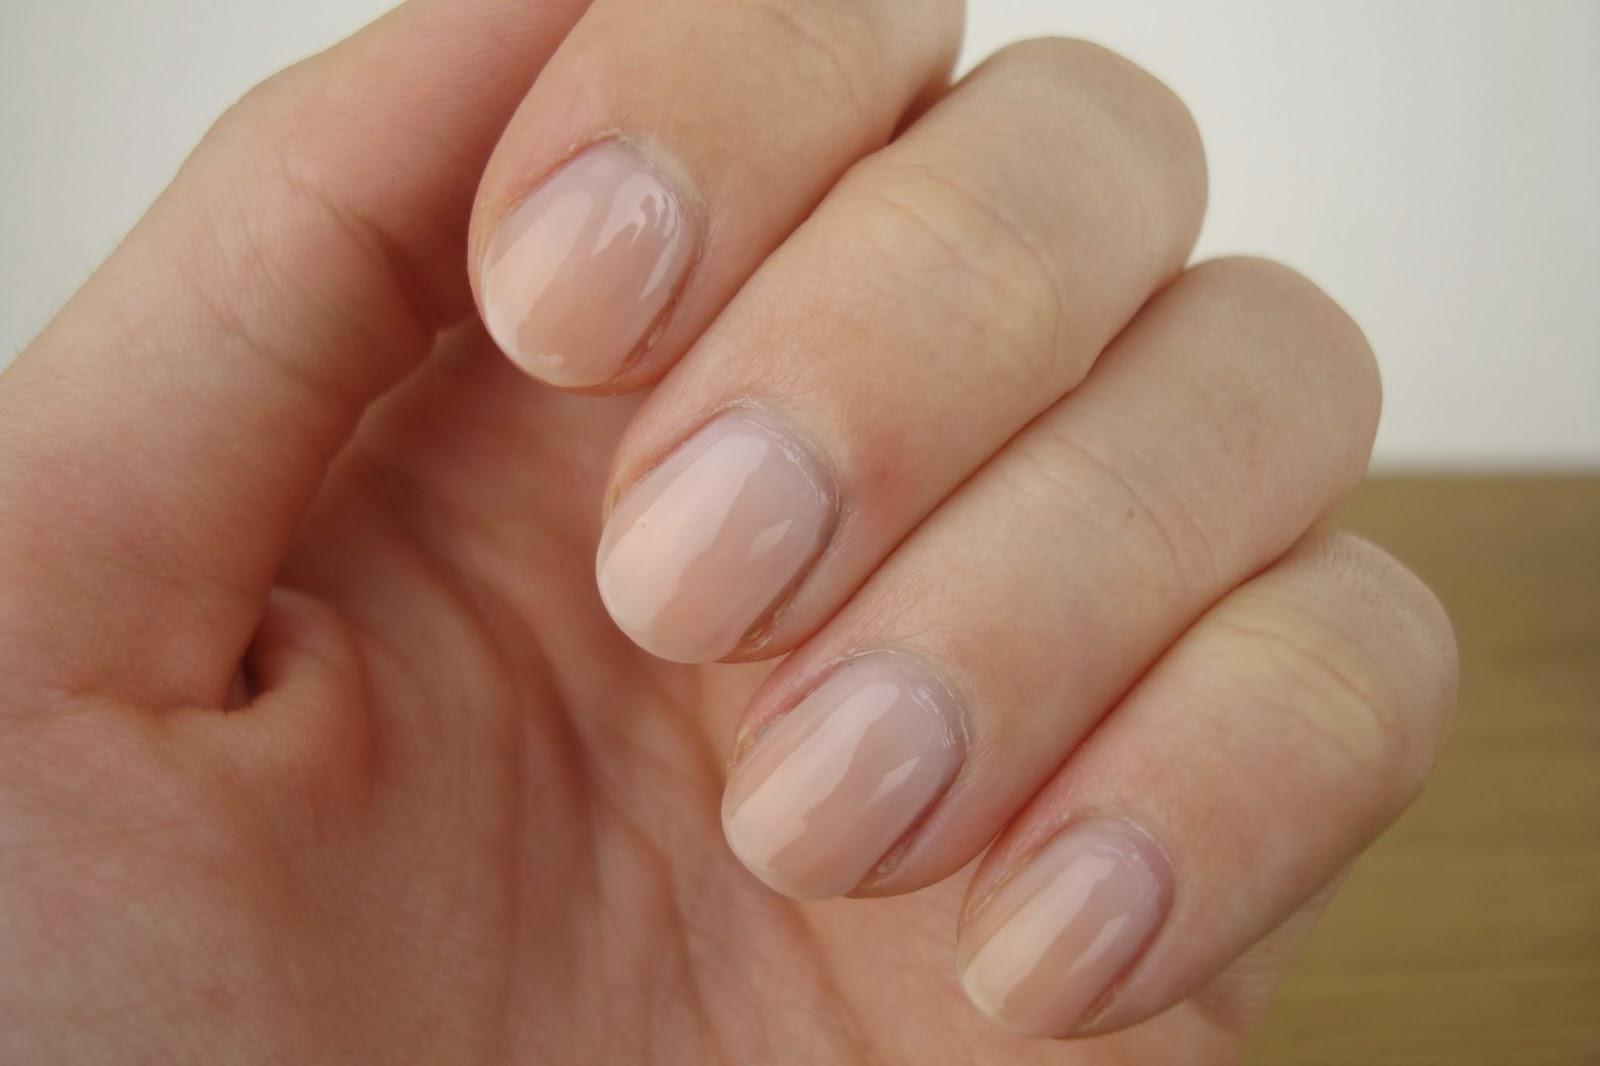 Hannah Georgina: Nutra Nail Gel Perfect 5 Minute Gel-Colour Manicure!